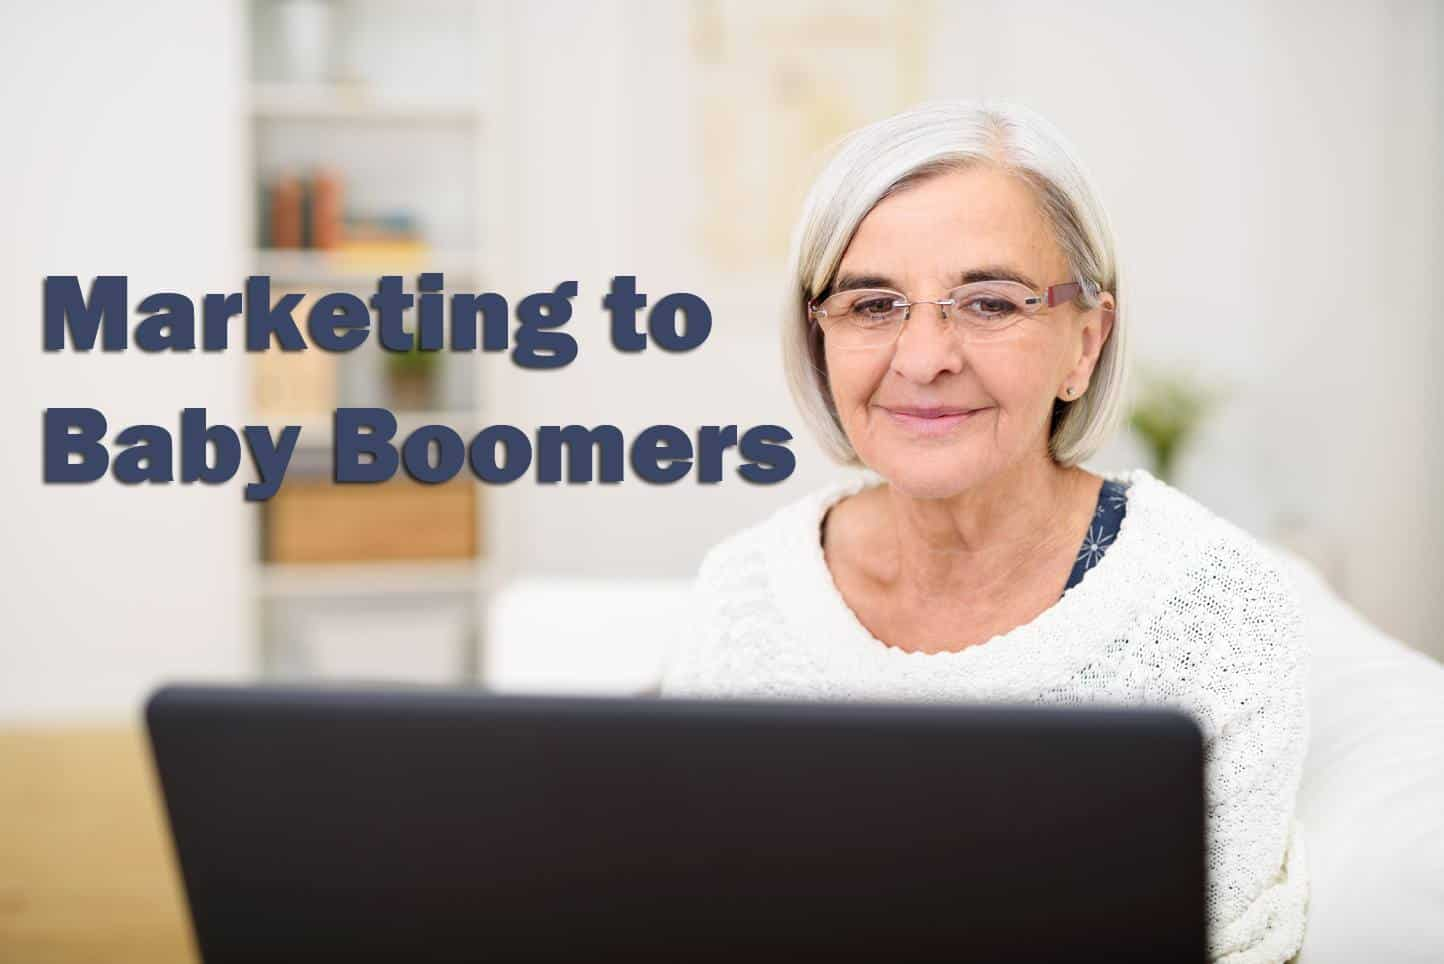 Marketing to Baby Boomers